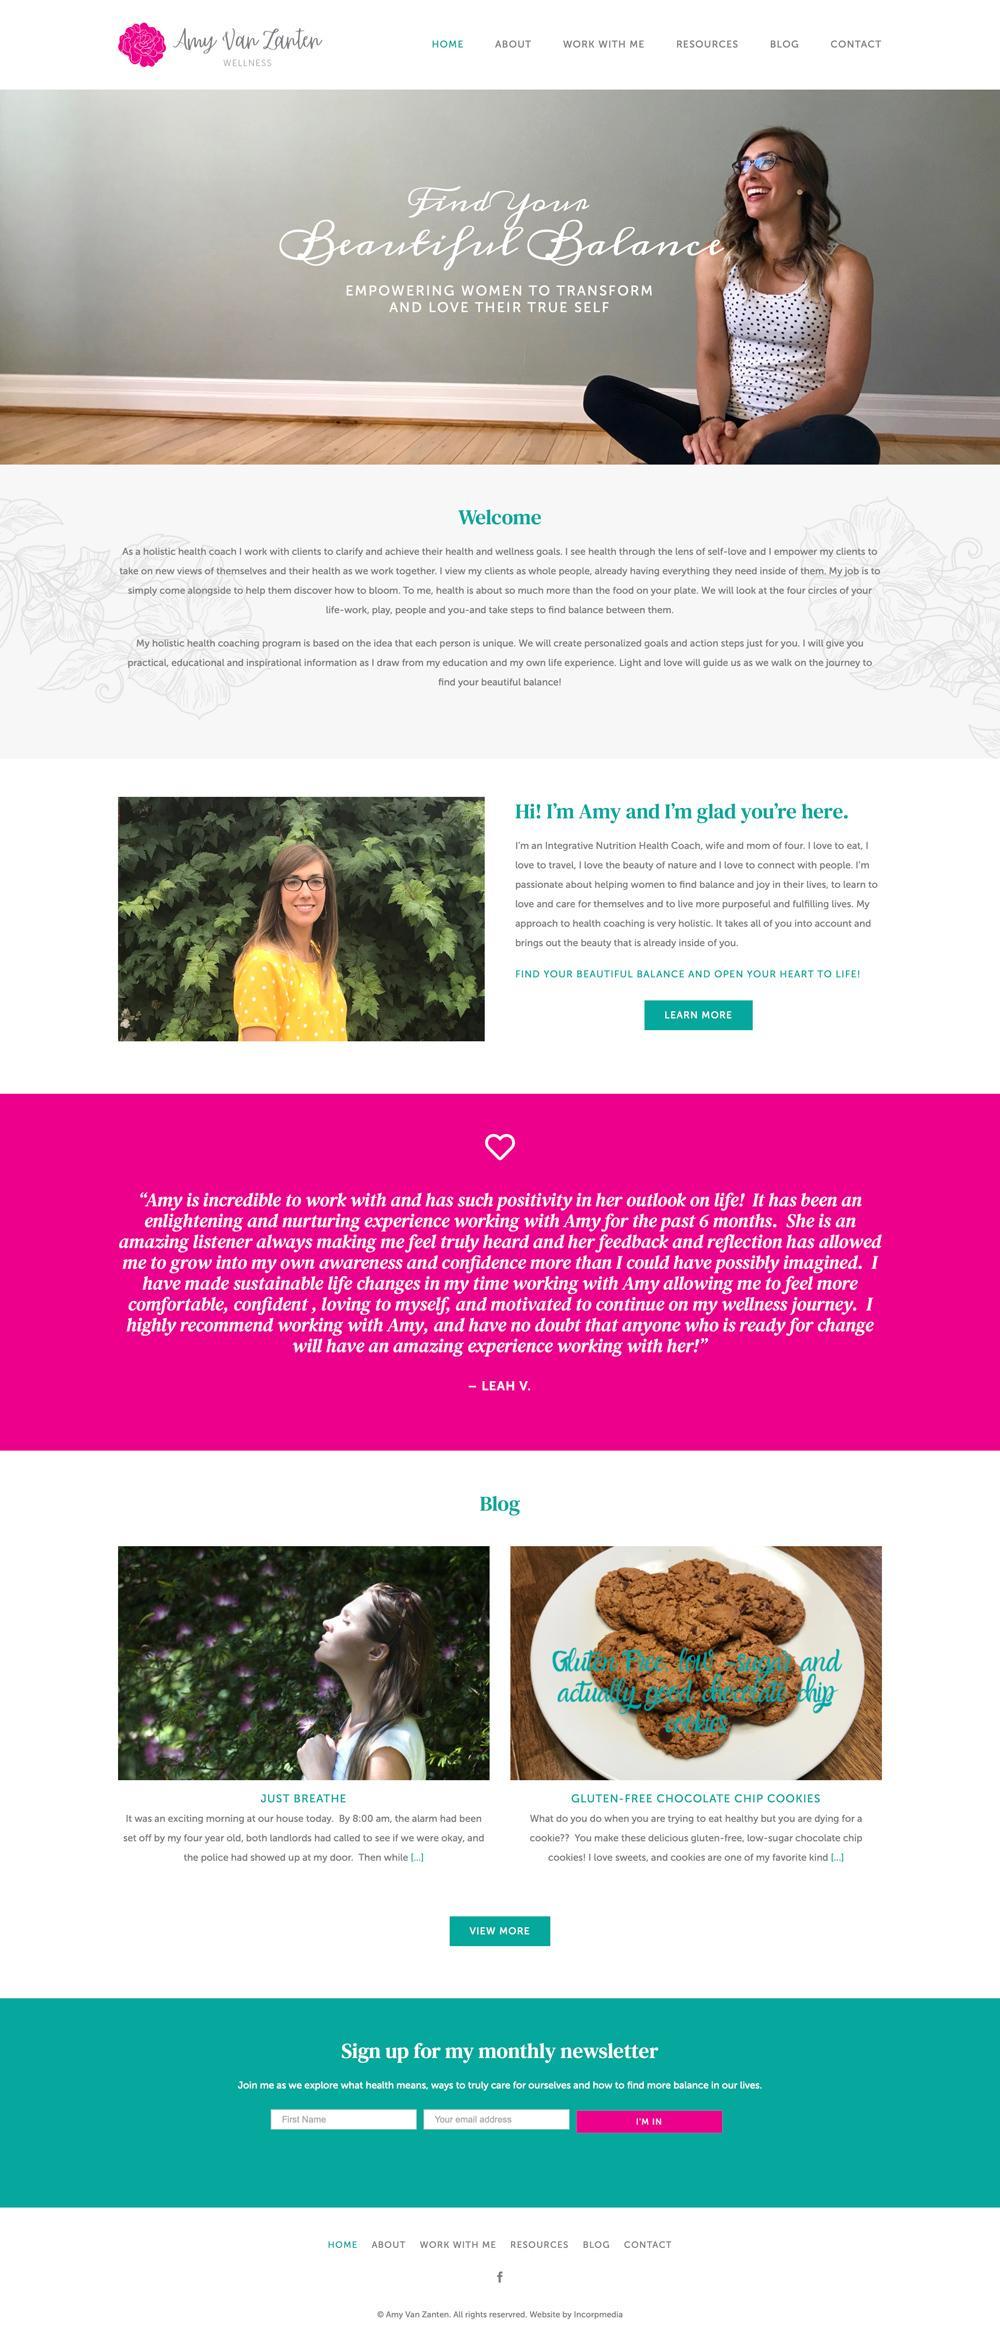 Amy Van Zanten Wellness Website Design and Development